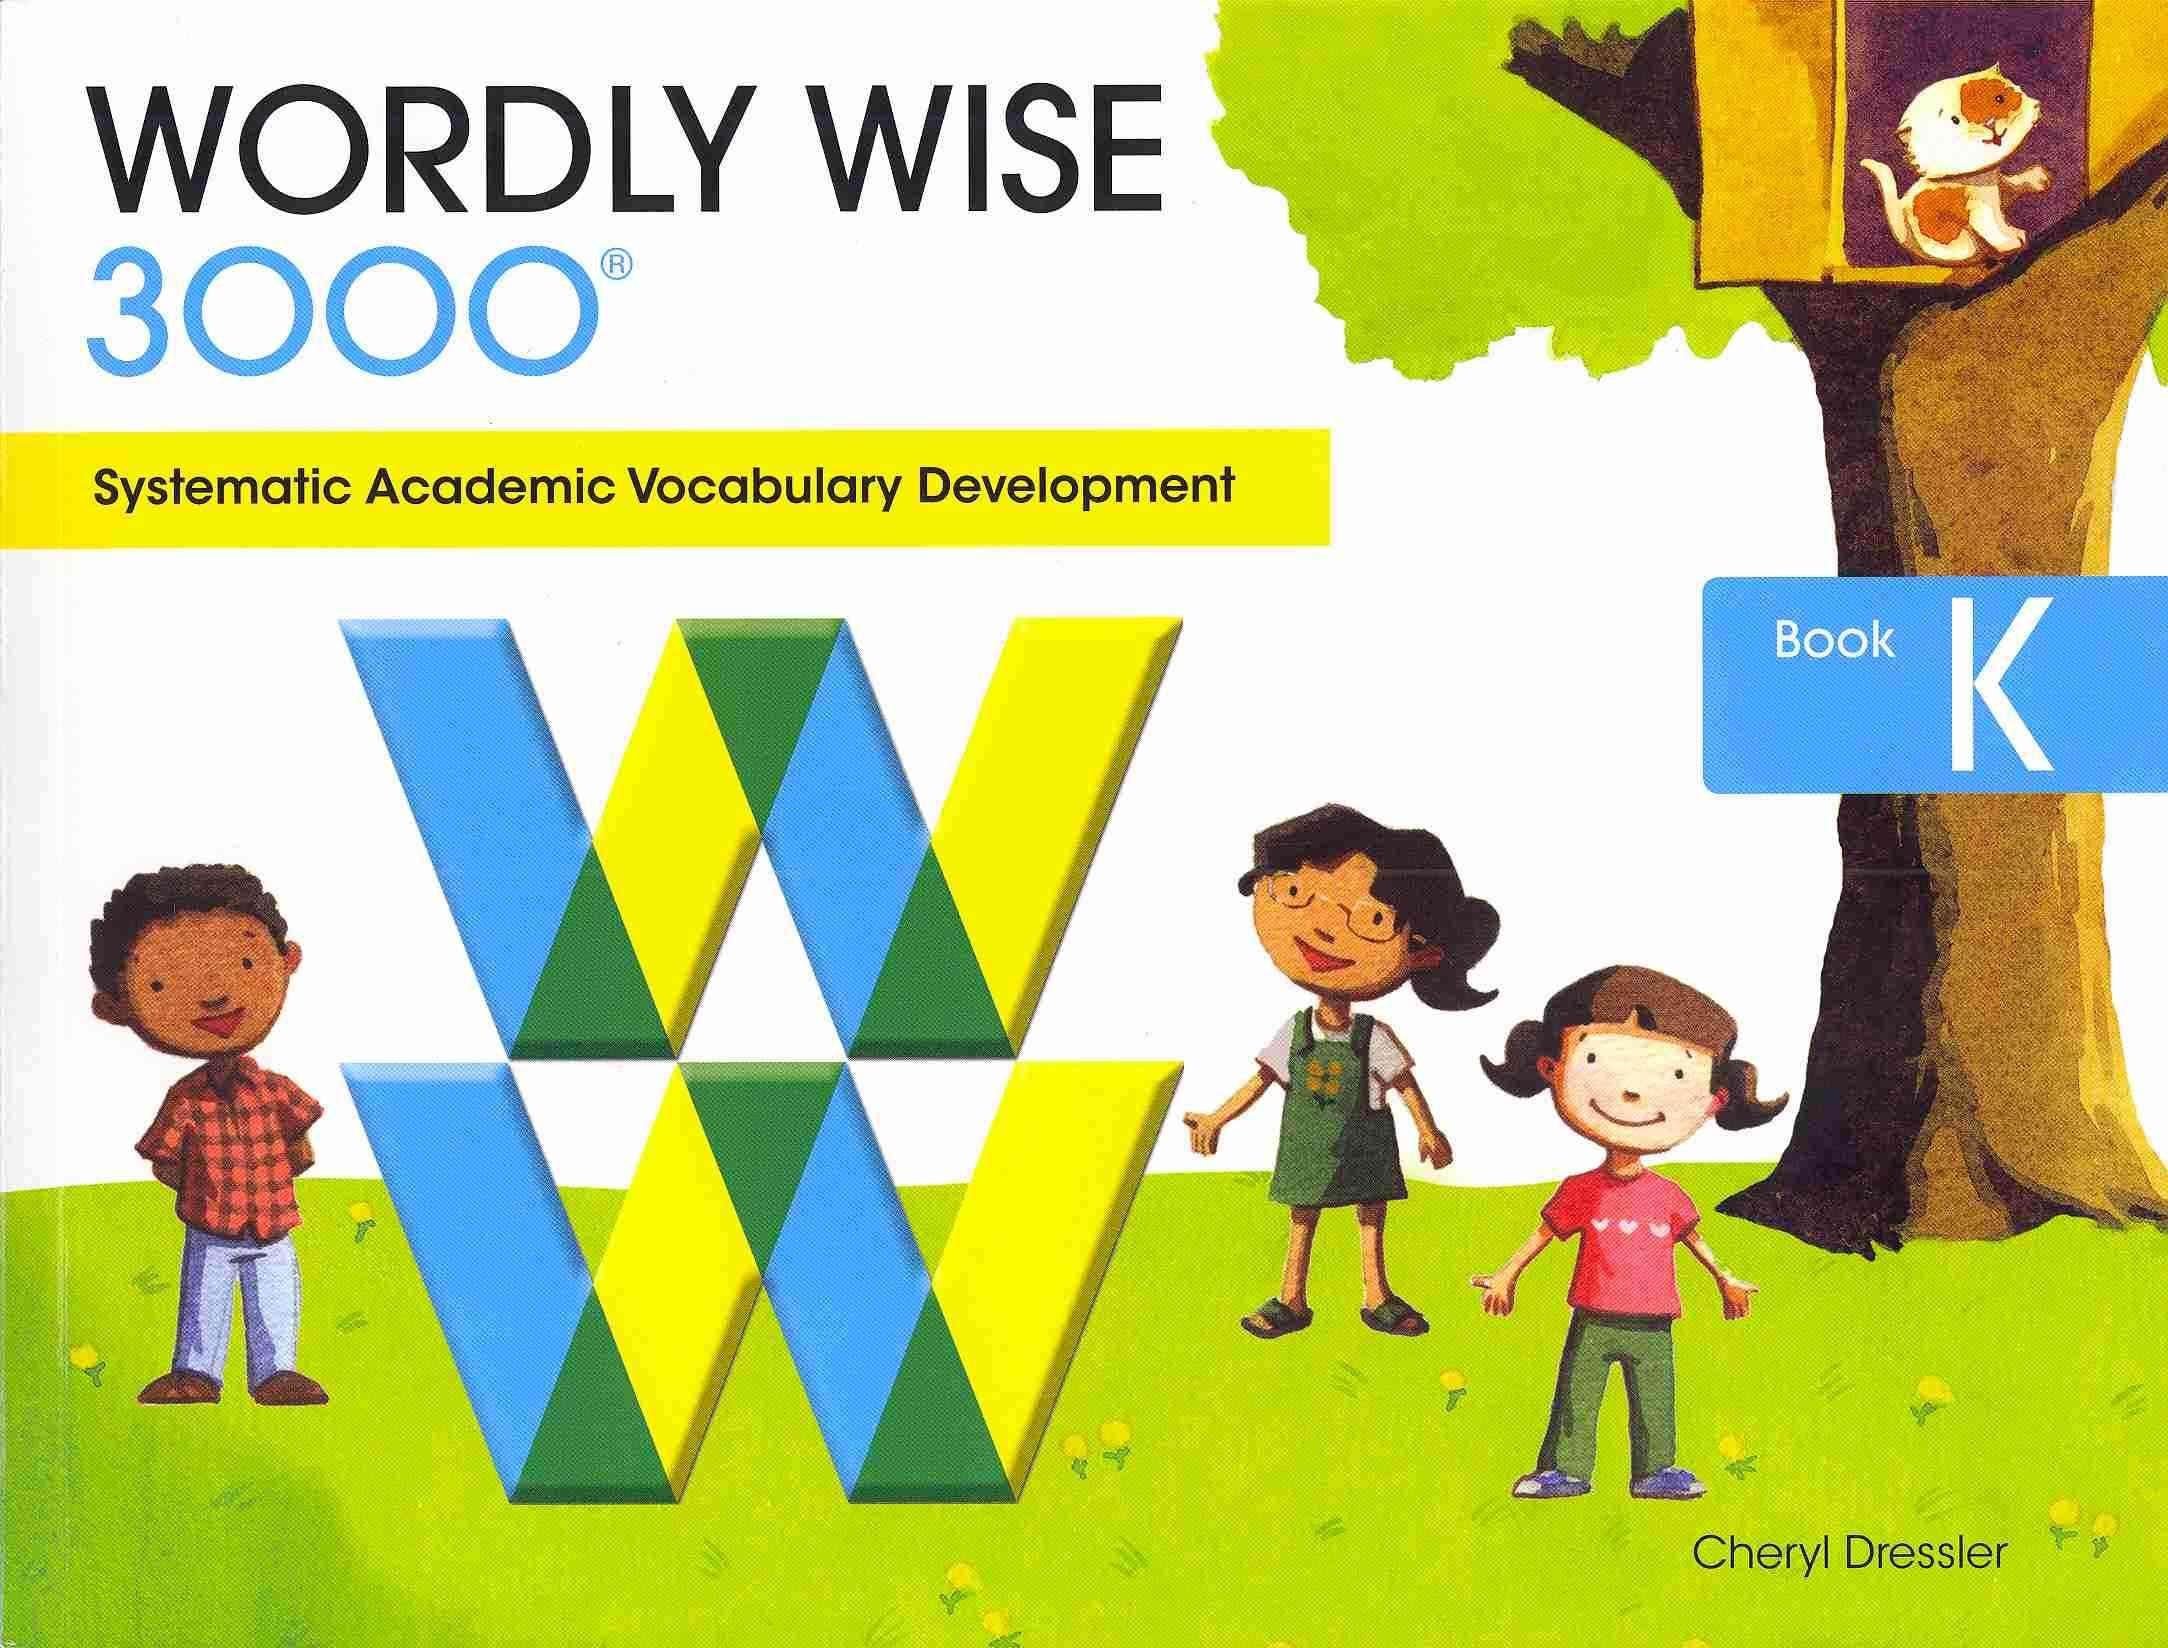 Wordly Wise 3000 By Dressler, Cheryl/ Langdo, Bryan (ILT)/ Bureau, Hannah (ILT)/ Ho, Jannie (ILT)